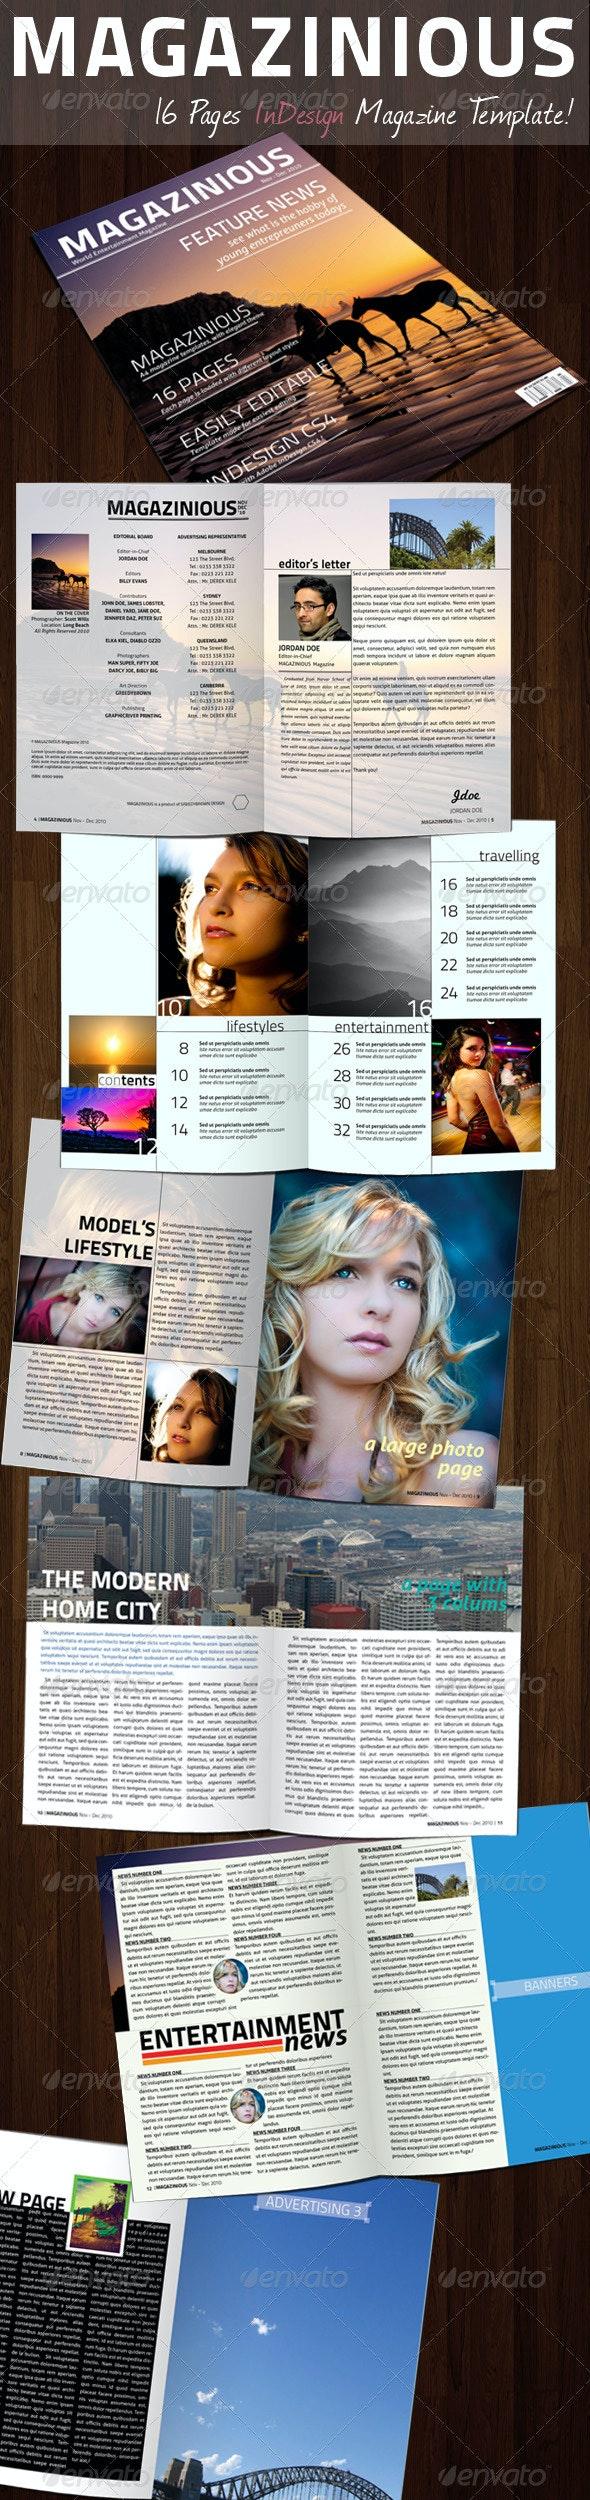 MAGAZINIOUS - InDesign Magazine Template - Magazines Print Templates